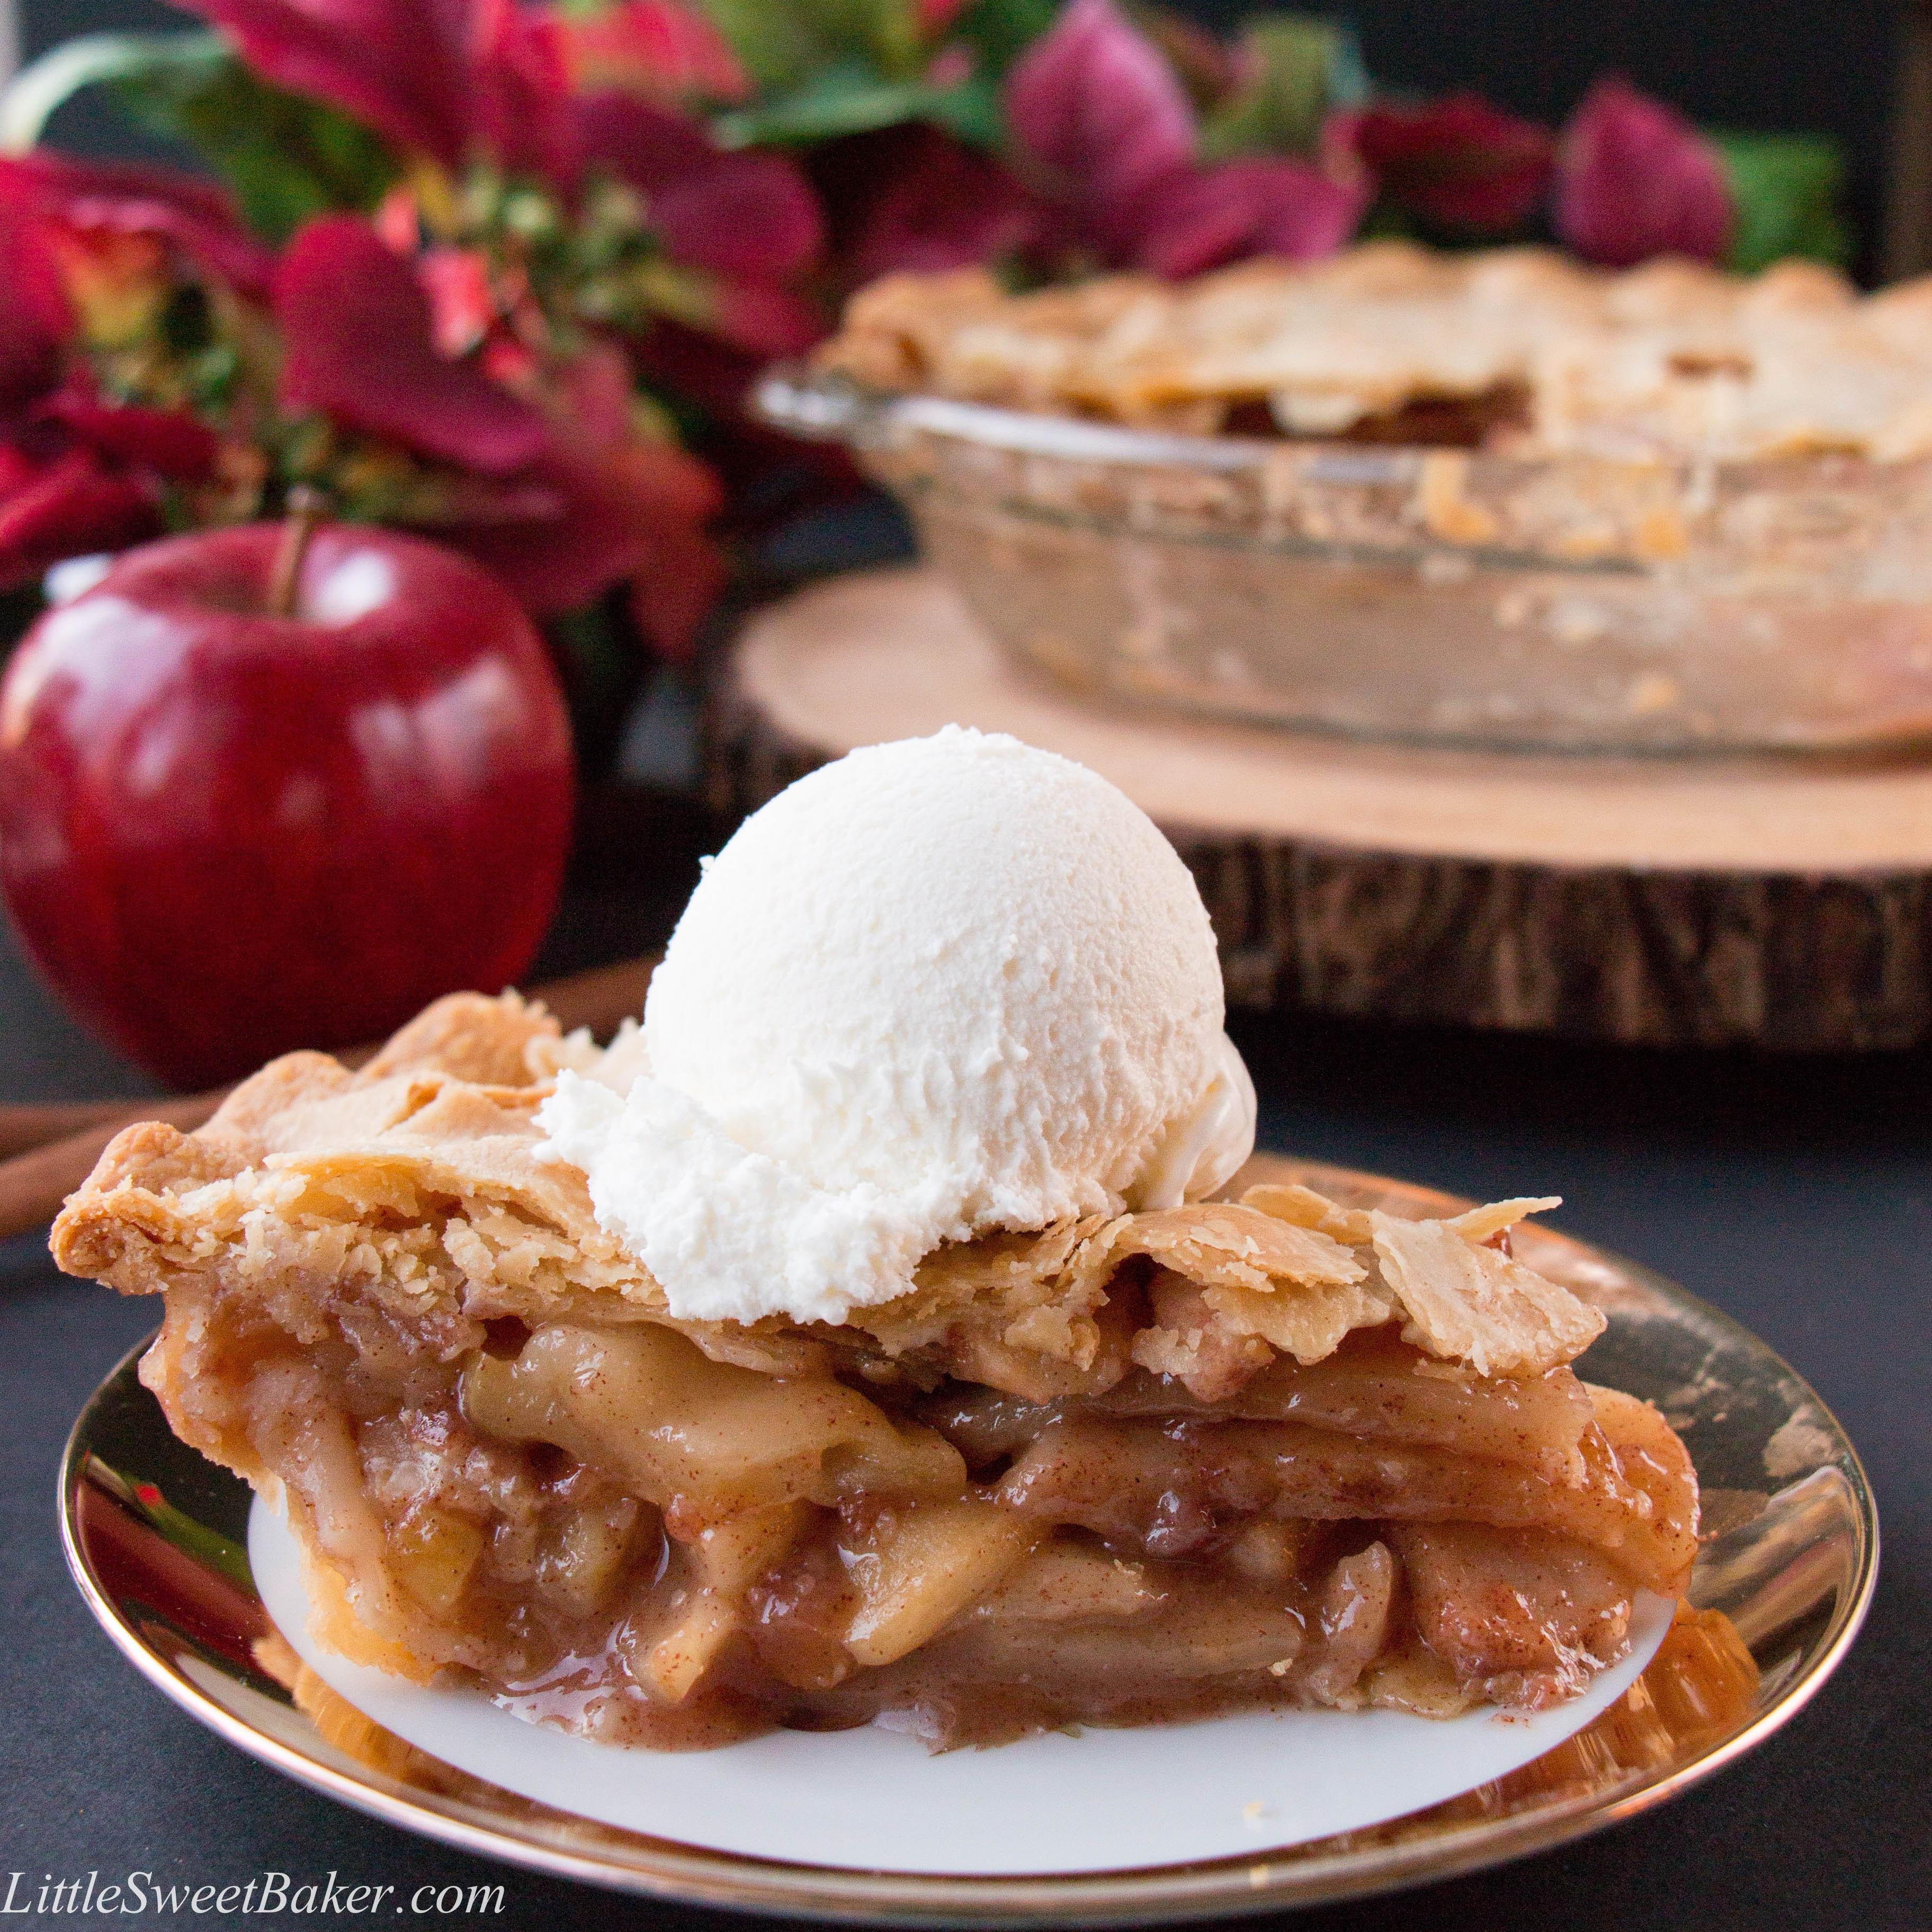 Easy Homemade Apple Pie  Easy Homemade Apple Pie video Little Sweet Baker